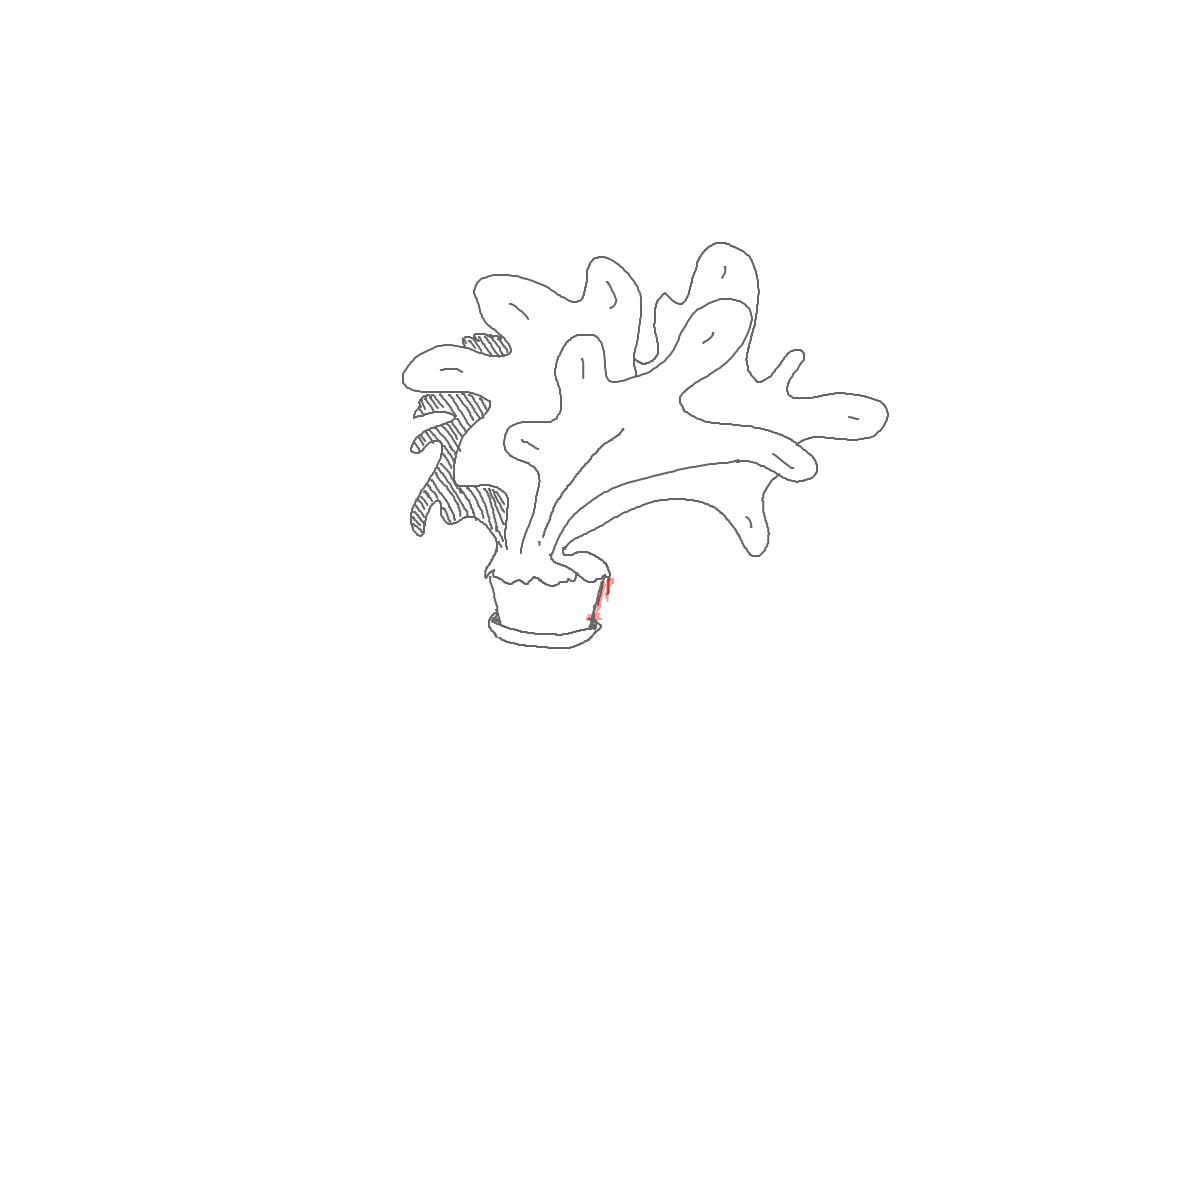 BAAAM drawing#8862 lat:52.0876045227050800lng: 4.3381972312927250